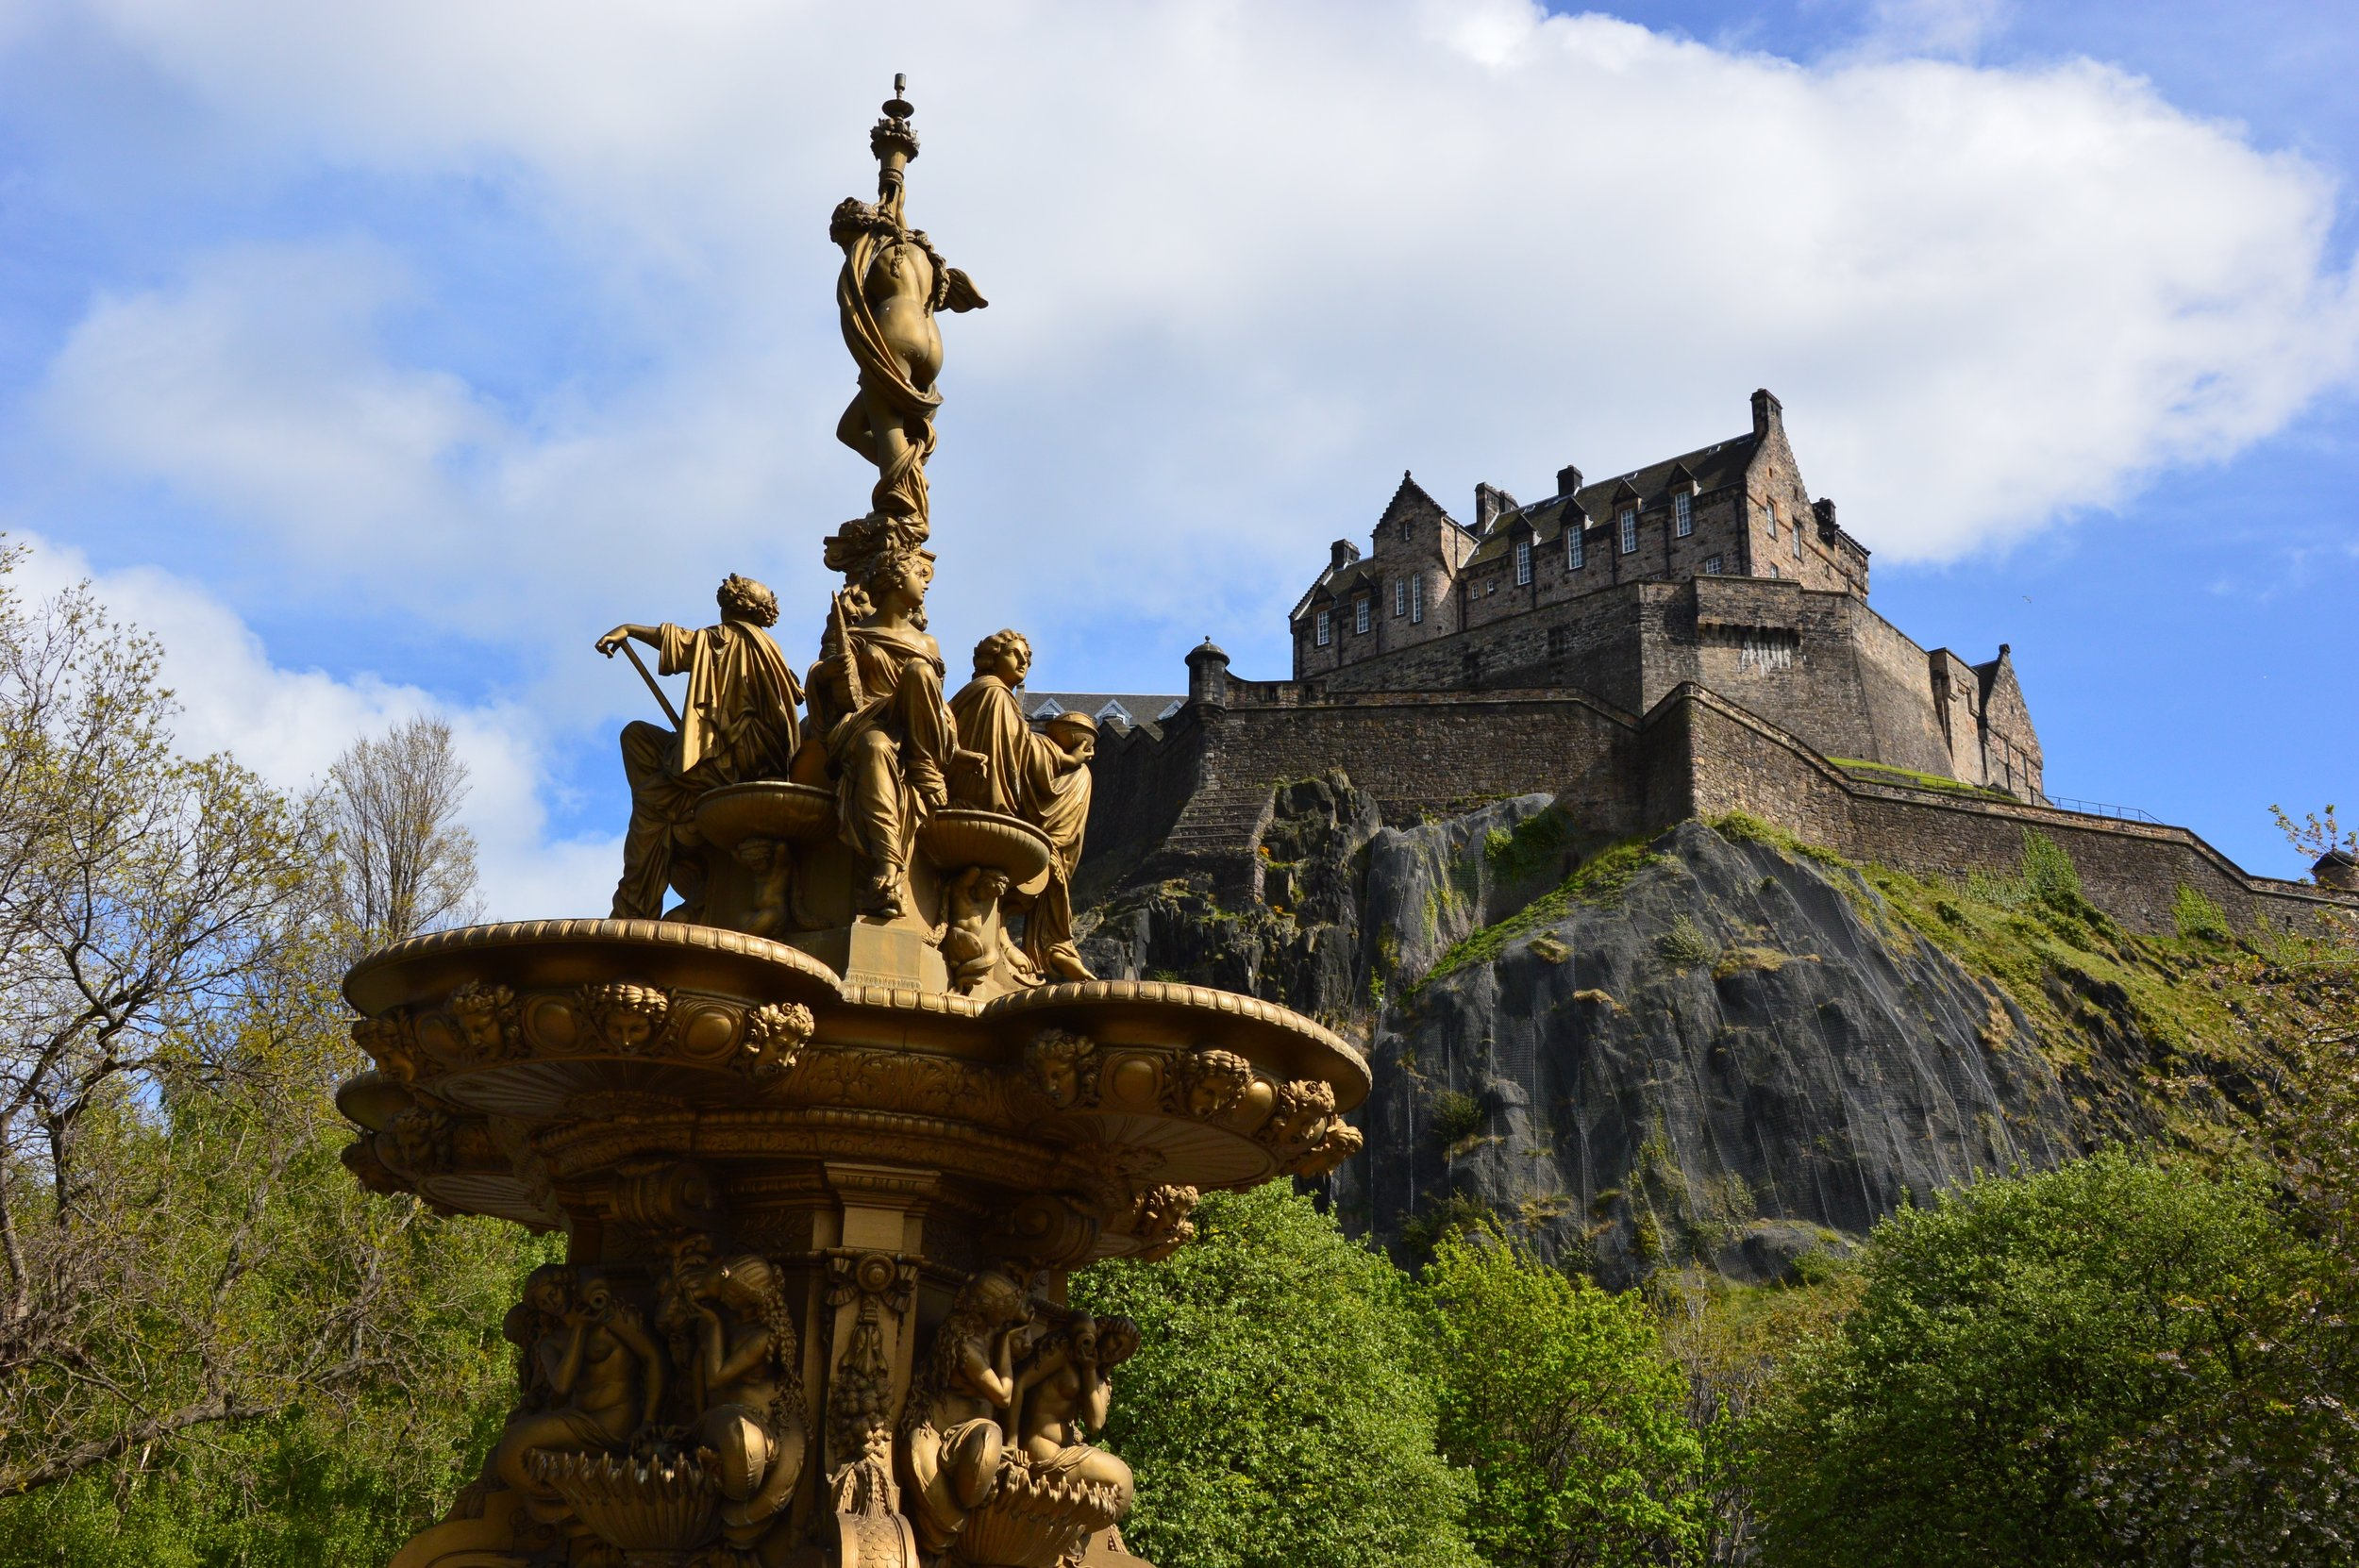 castle-edinburgh-art-fountain.jpg